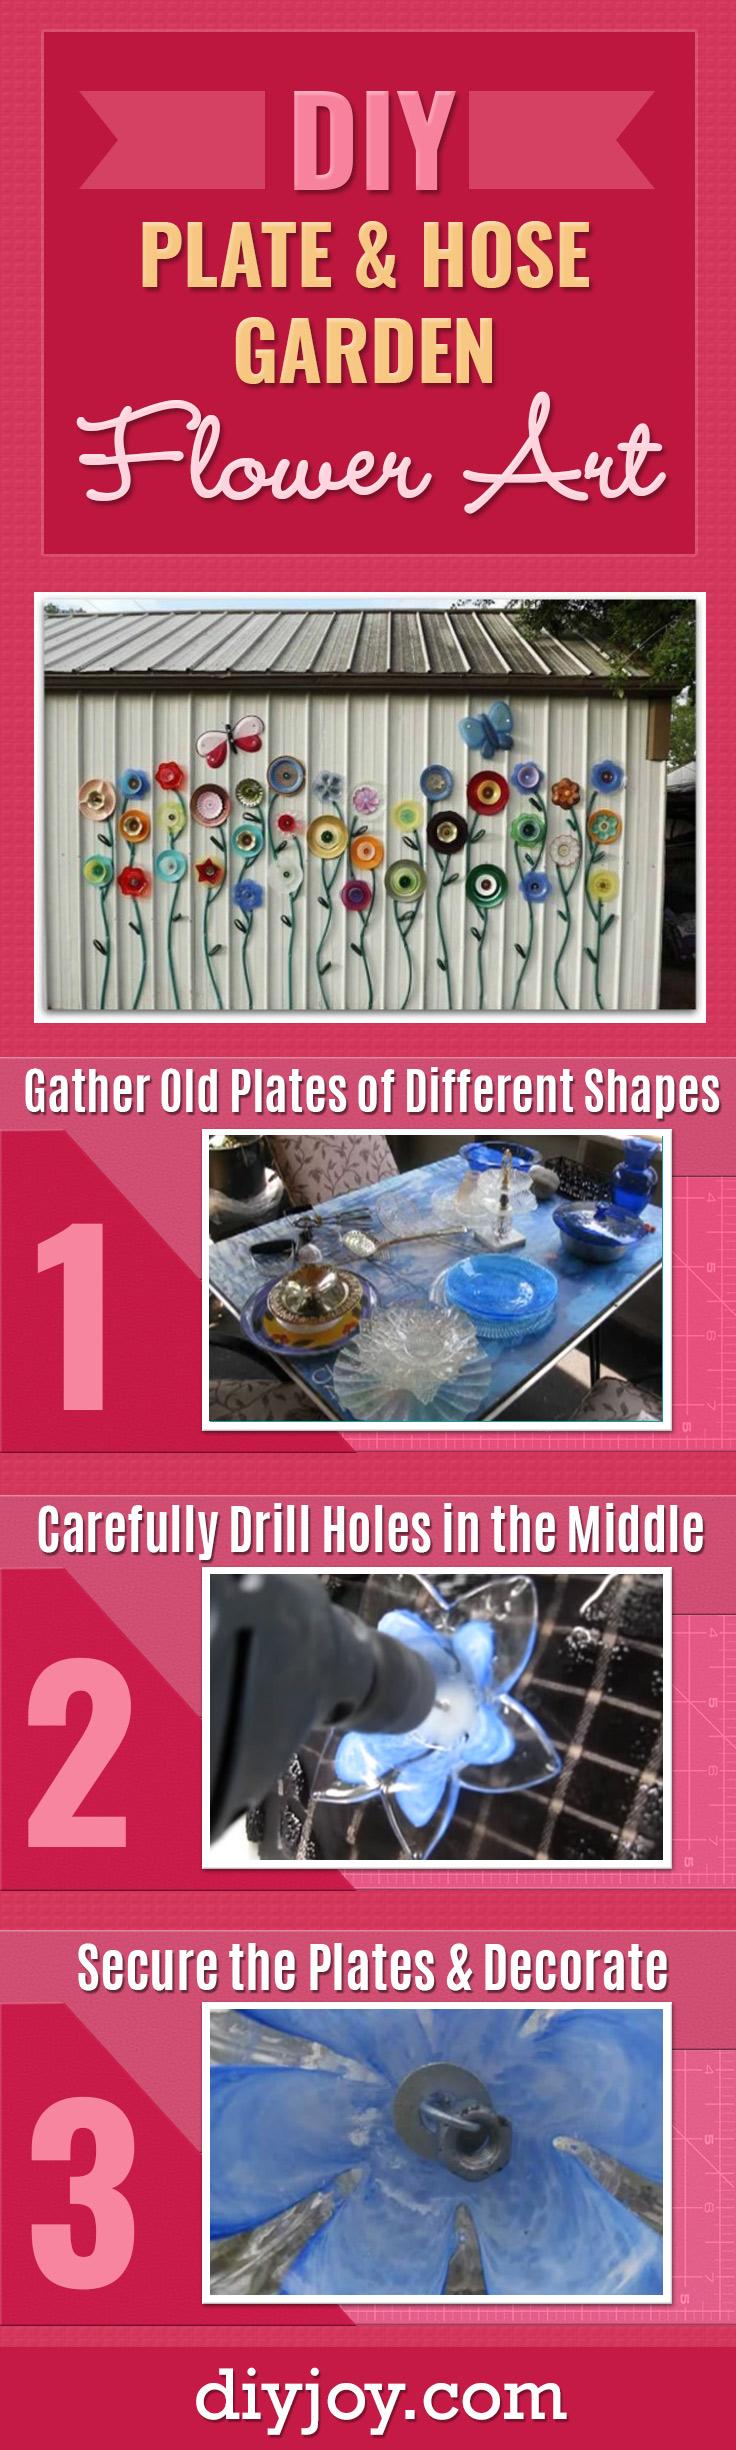 Garden Hose And Plate Outdoor Art Idea